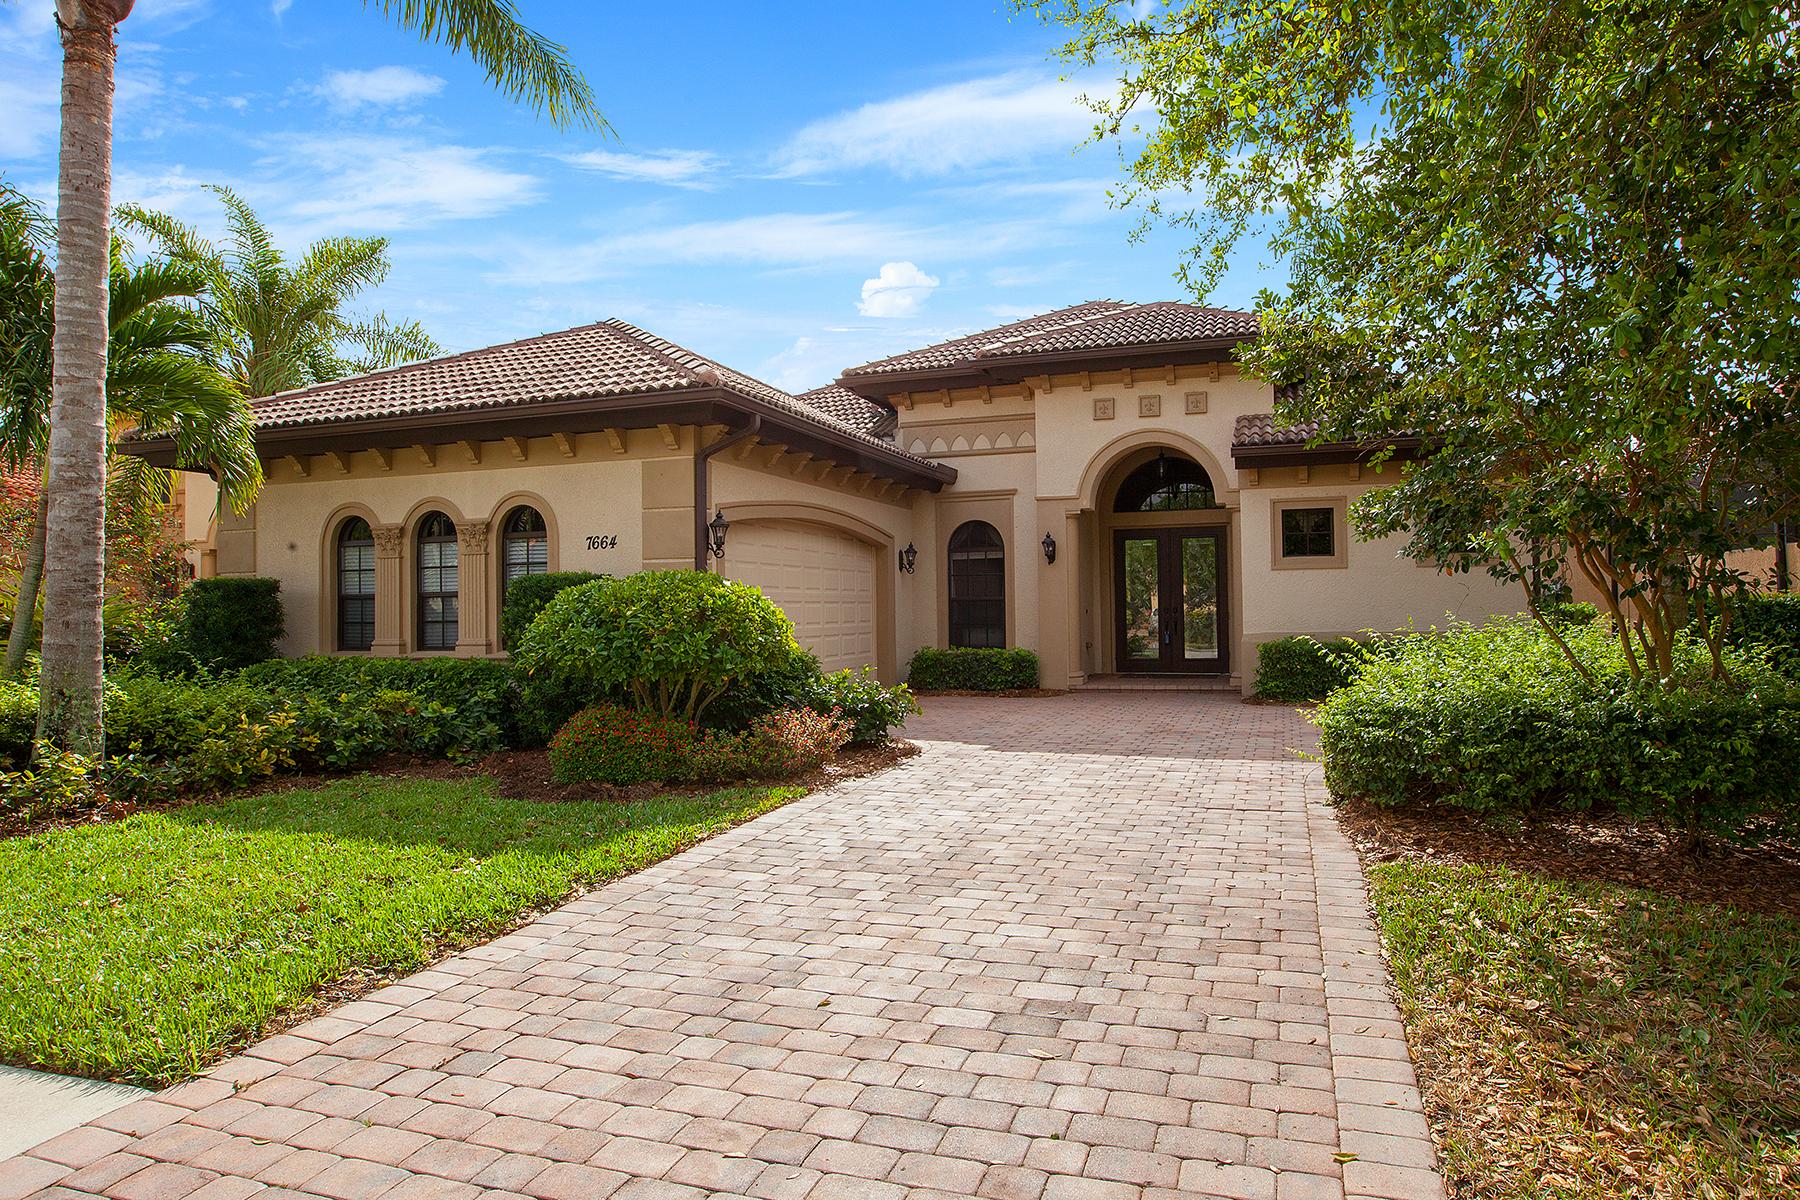 獨棟家庭住宅 為 出售 在 LELY RESORT - LELY RESORT 7664 Sussex Ct Naples, 佛羅里達州, 34113 美國